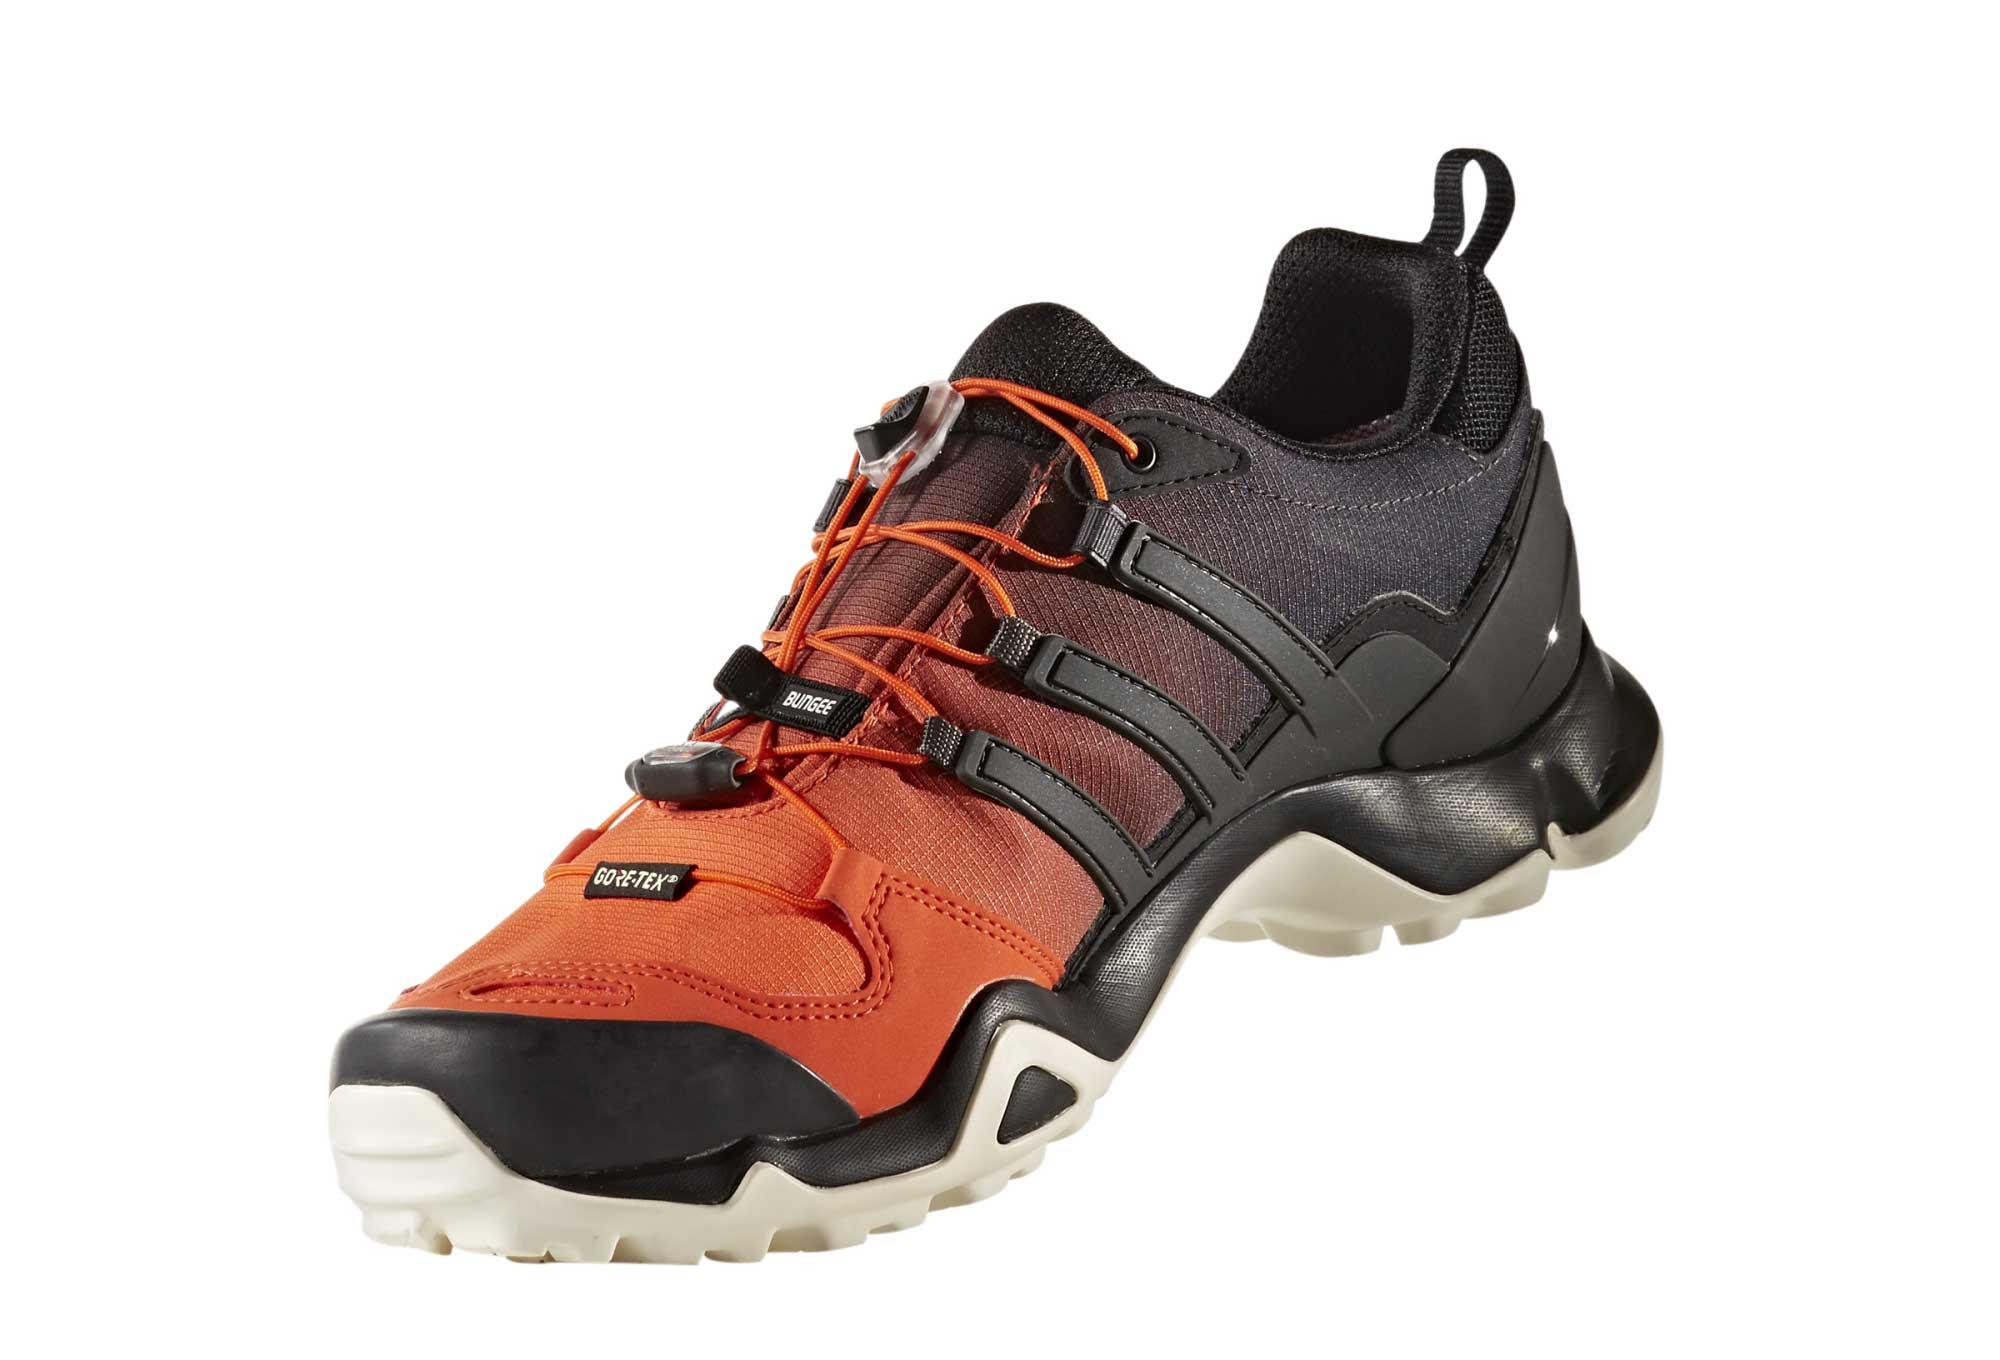 Adidas Gtx Orange Chaussures Running De Trail Swift Terrex Noir R qrz6E0wzH